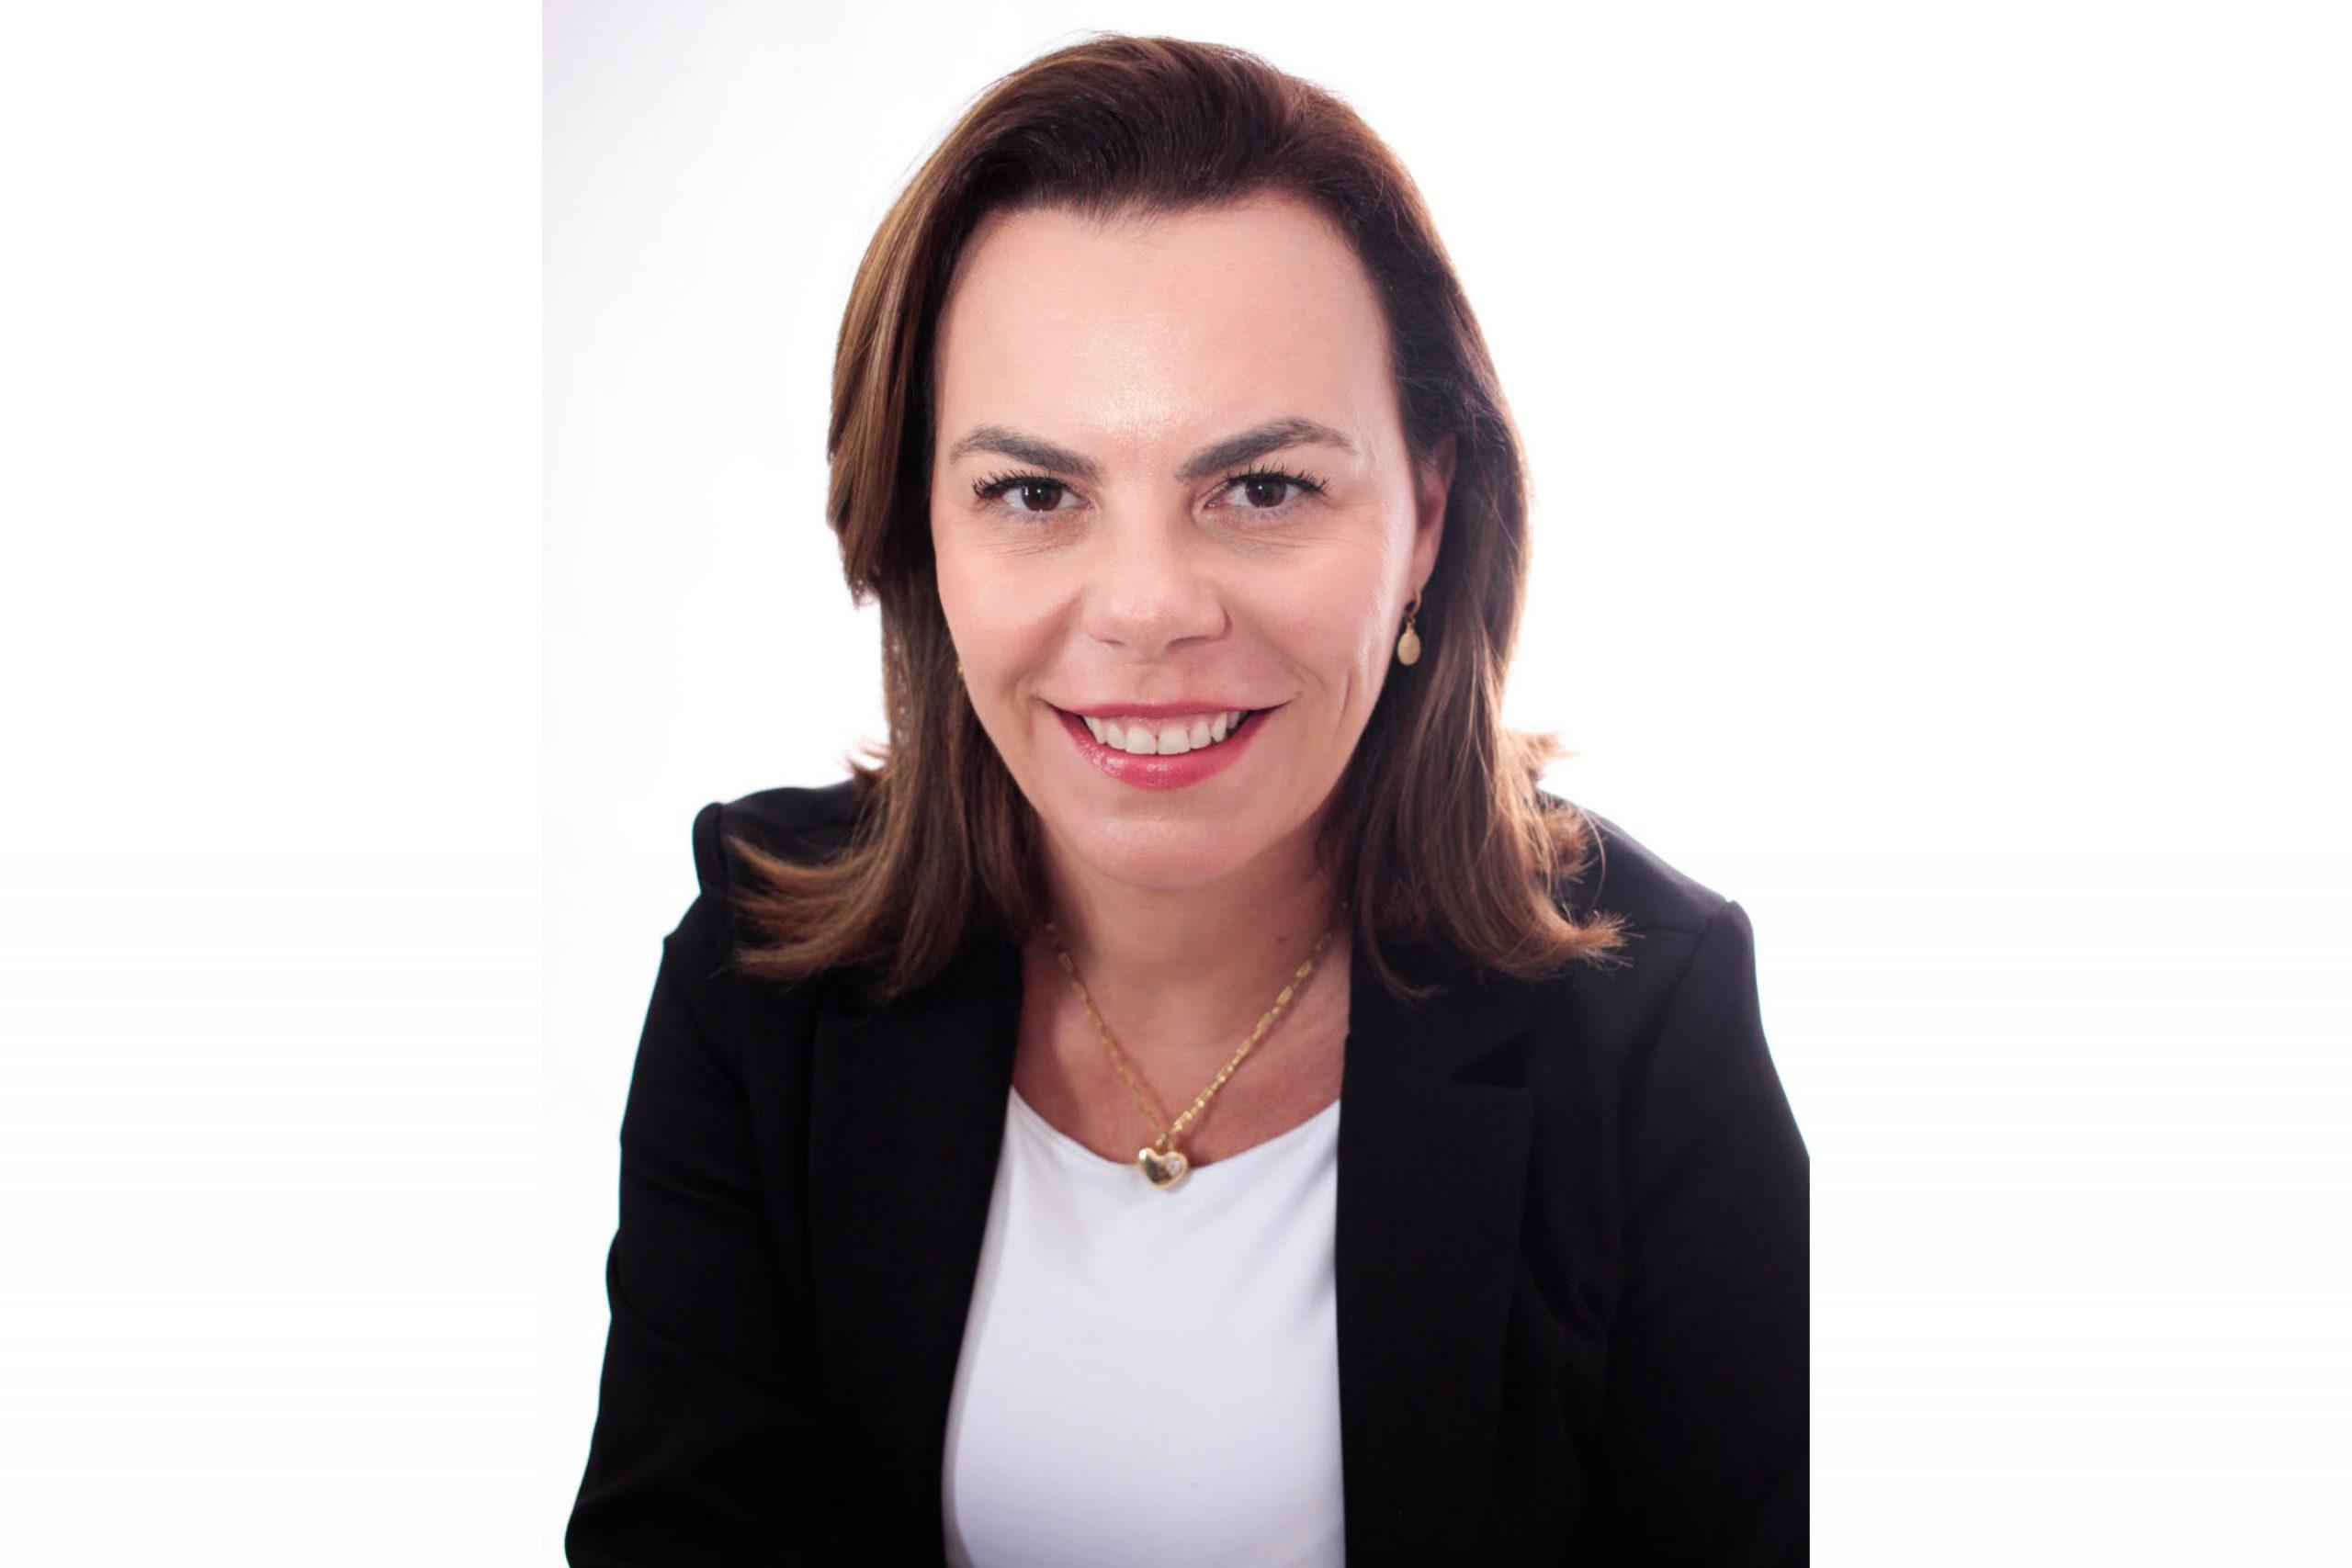 Perfil ABRAFAC: Irimar Palombo, presidente e sócia-fundadora